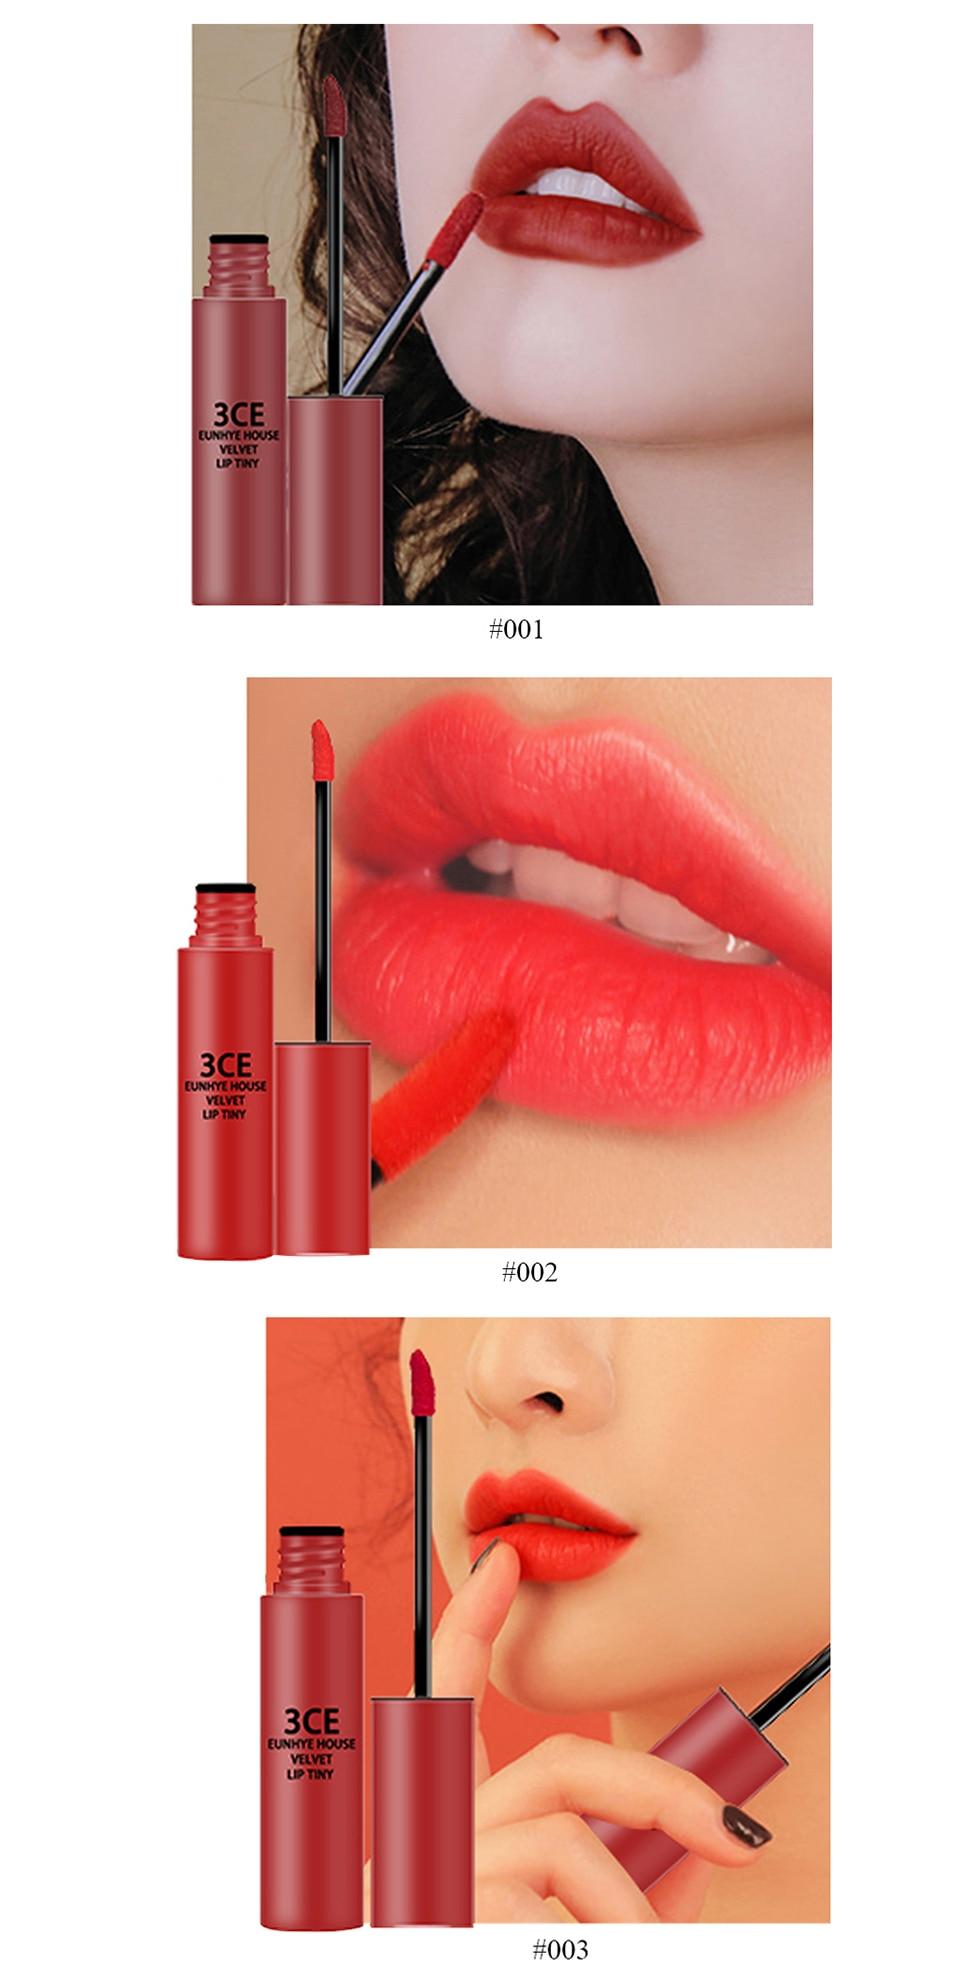 3CE Eunhye House Brand New Lip Cosmetics 3 colors Lip glaze Moisturizer Long-lasting Lip Makeup for common 13